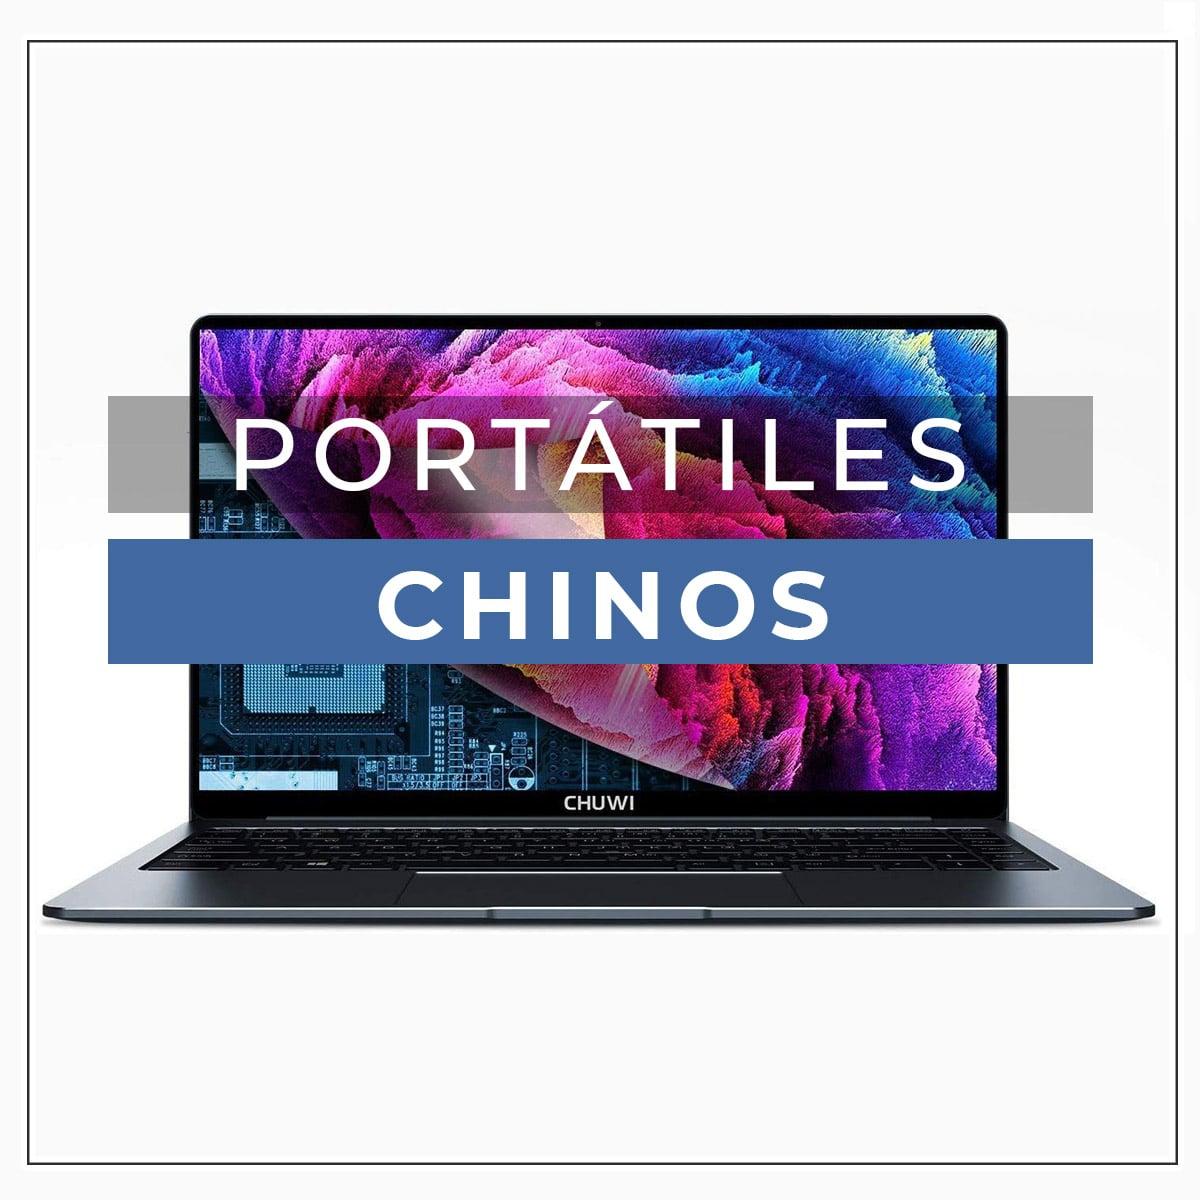 portatiles chinos